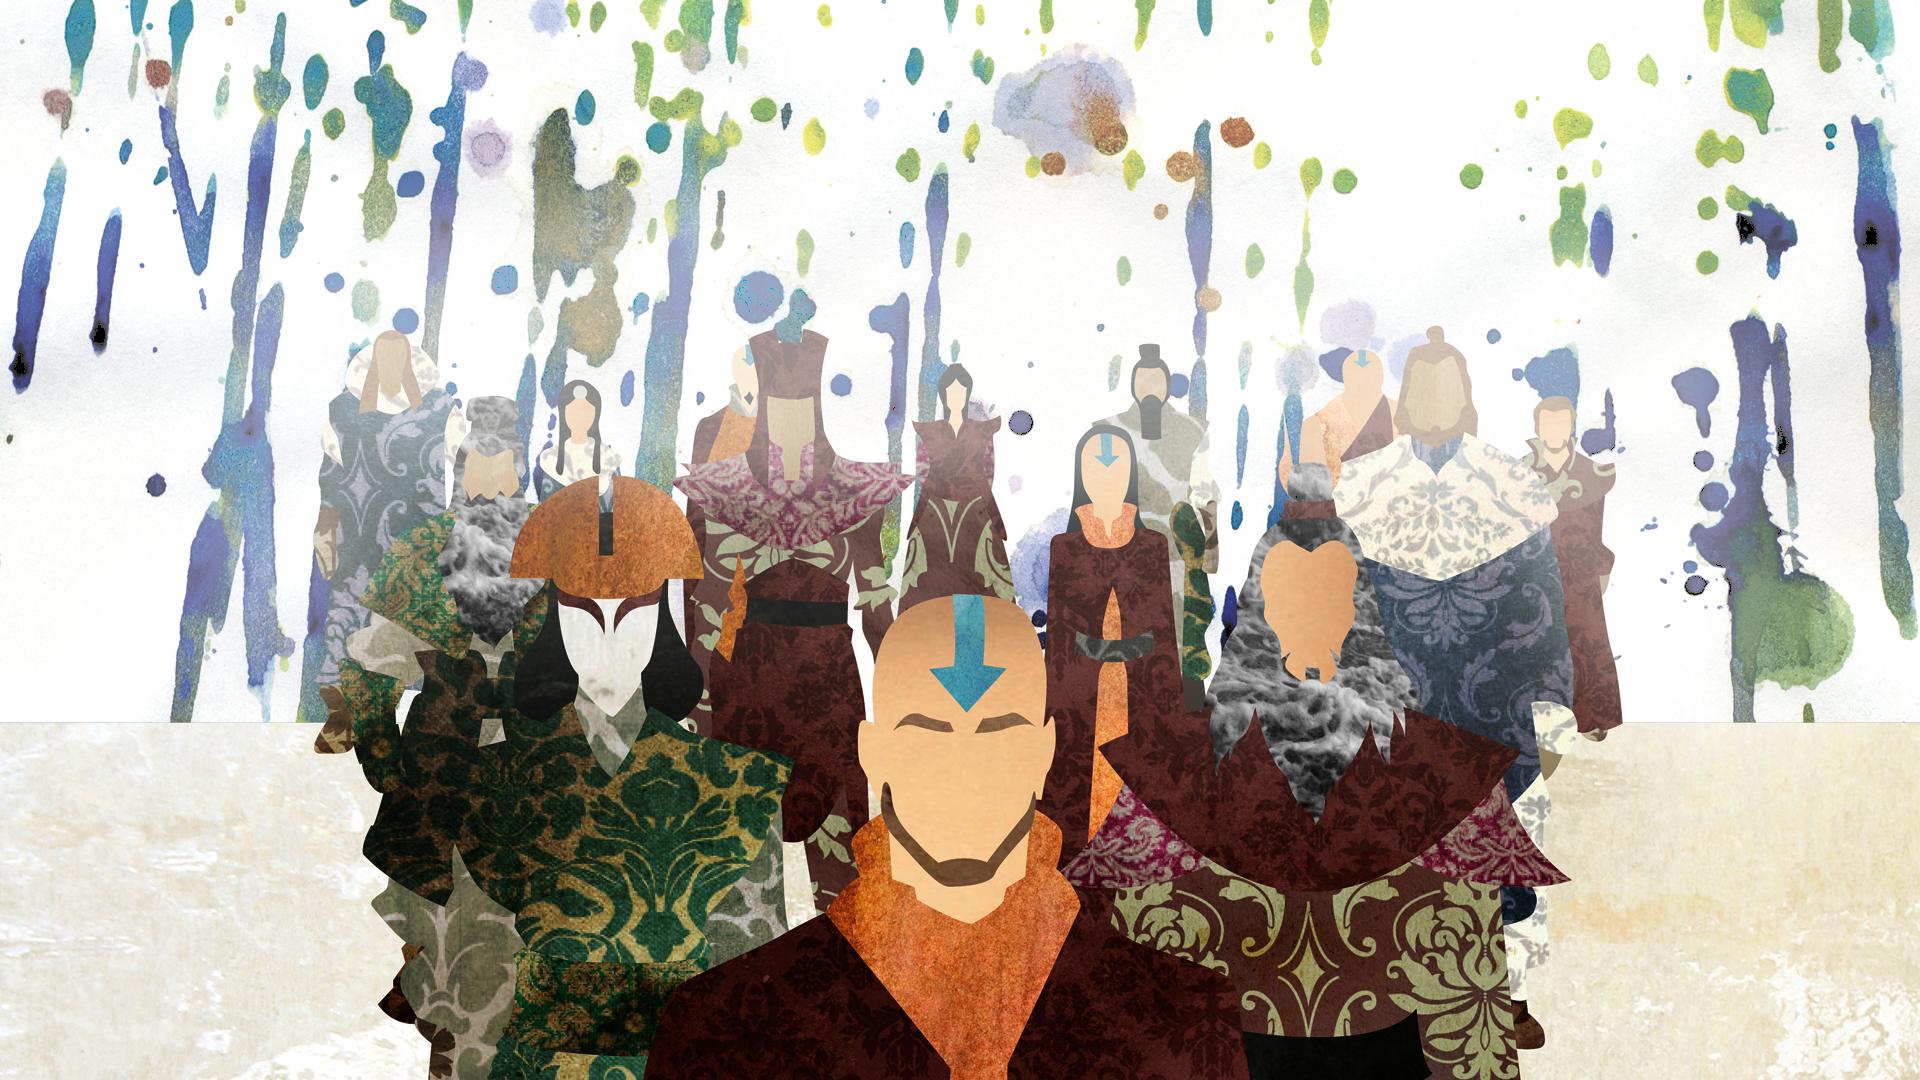 Anime   Avatar The Last Airbender Wallpaper 1920x1080